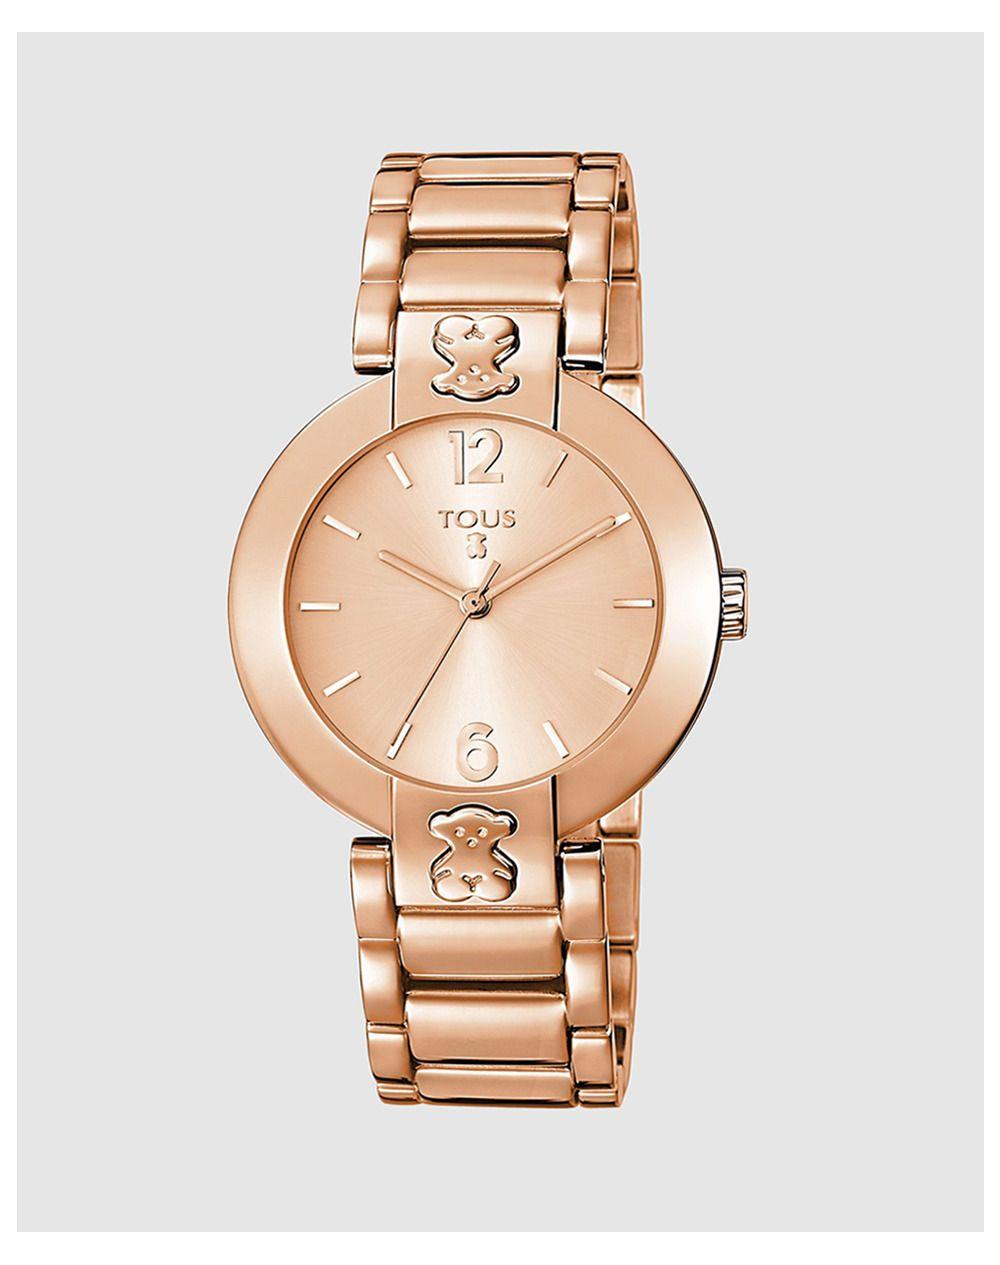 c09c3898026a Reloj de mujer Hello Darling Swatch | Shoping II Compras | Reloj ...